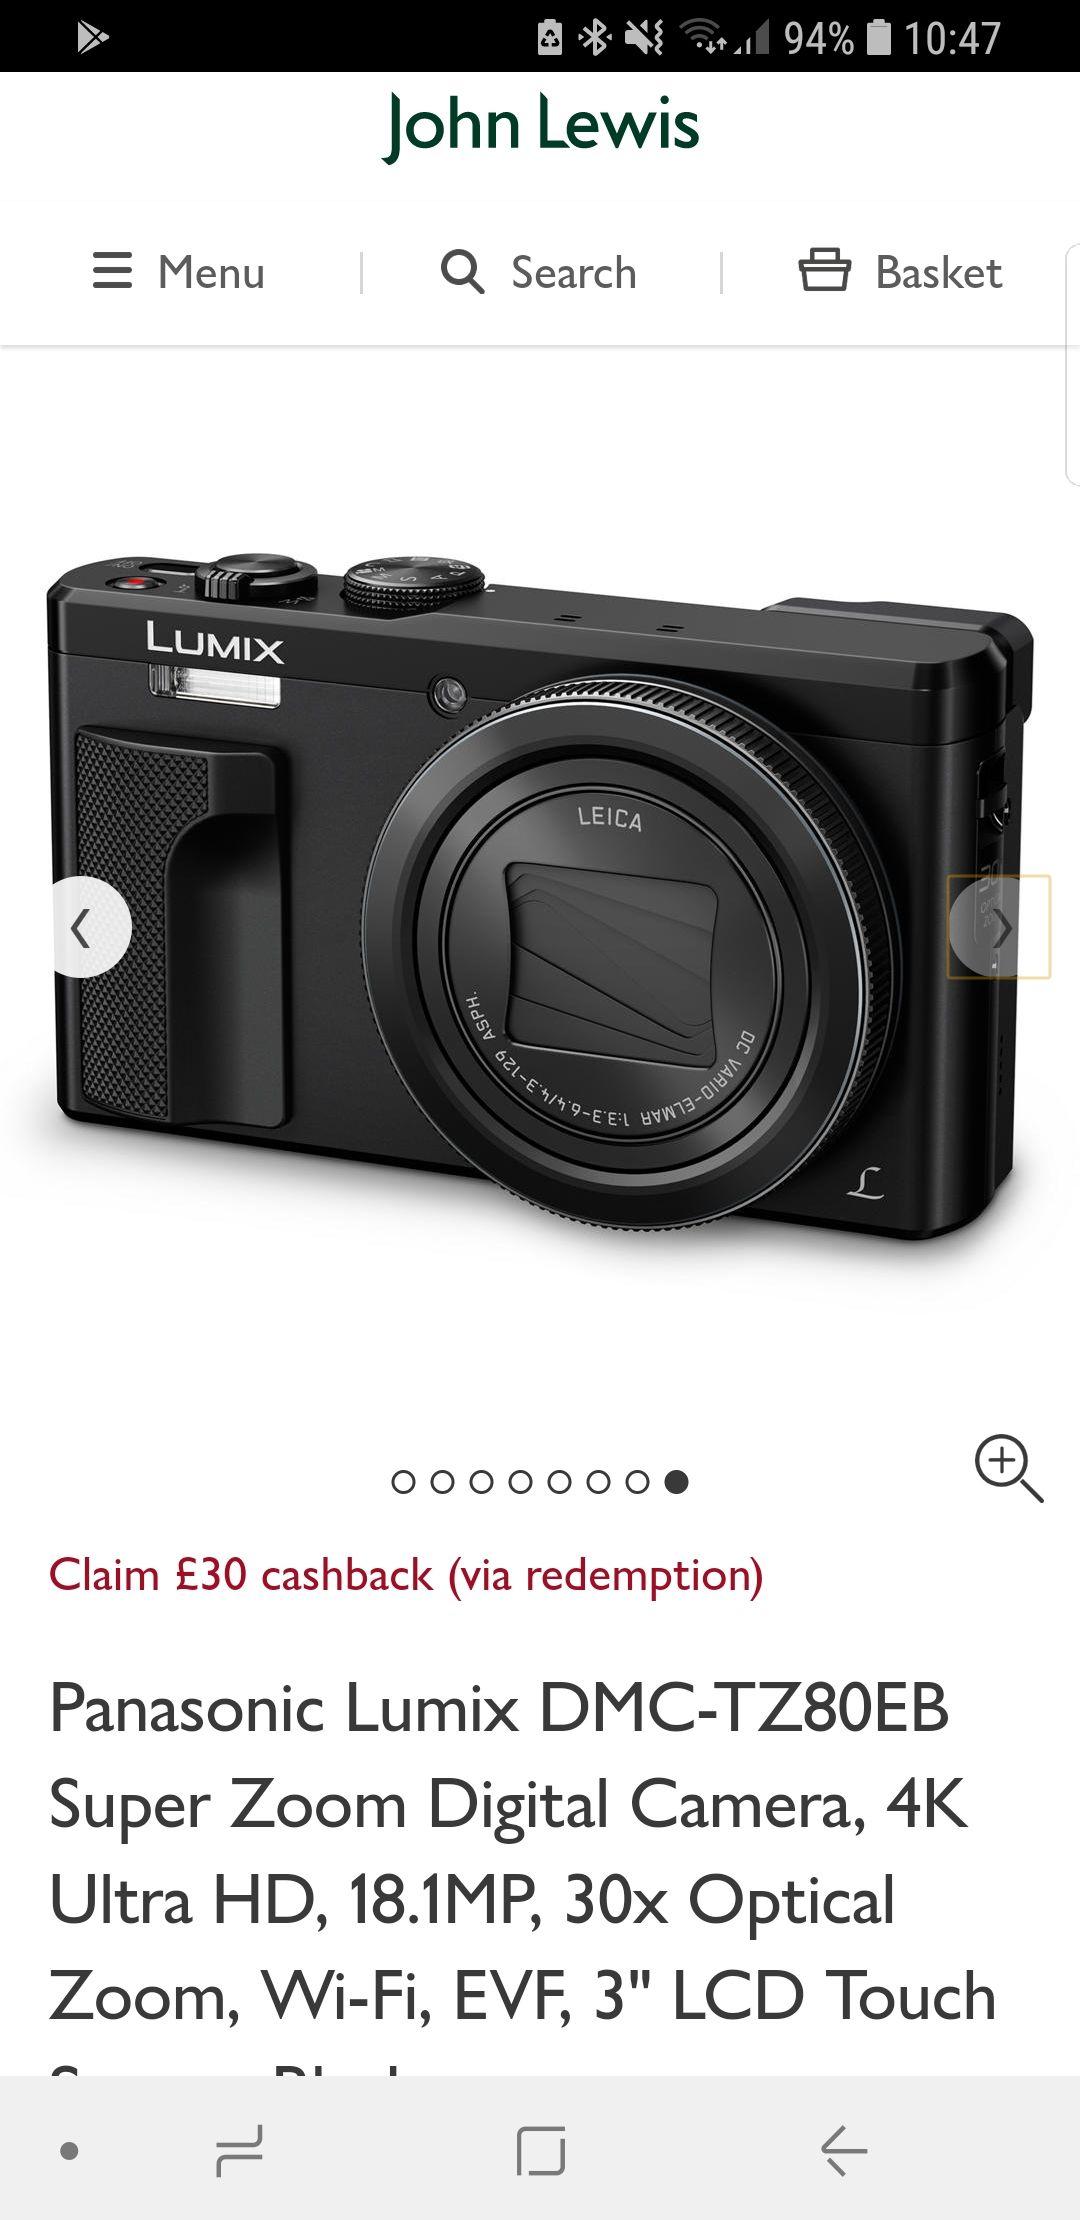 Panasonic TZ80 at John Lewis £249 - £30 cashback from Panasonic + 2 year guarantee!!